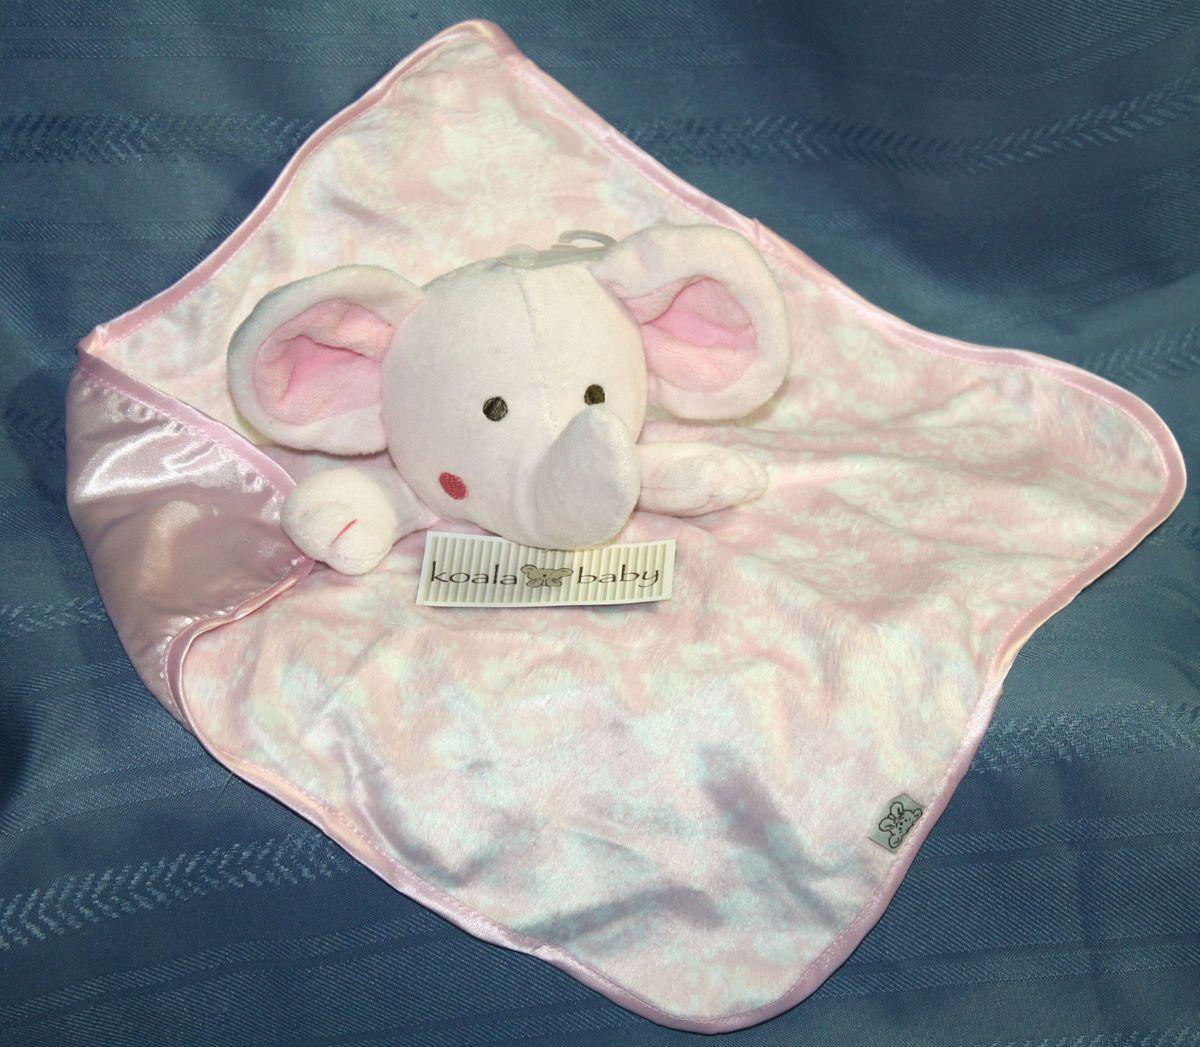 Koala Baby Girls Elephant Pink Satin Plush Security Blanket Toy New